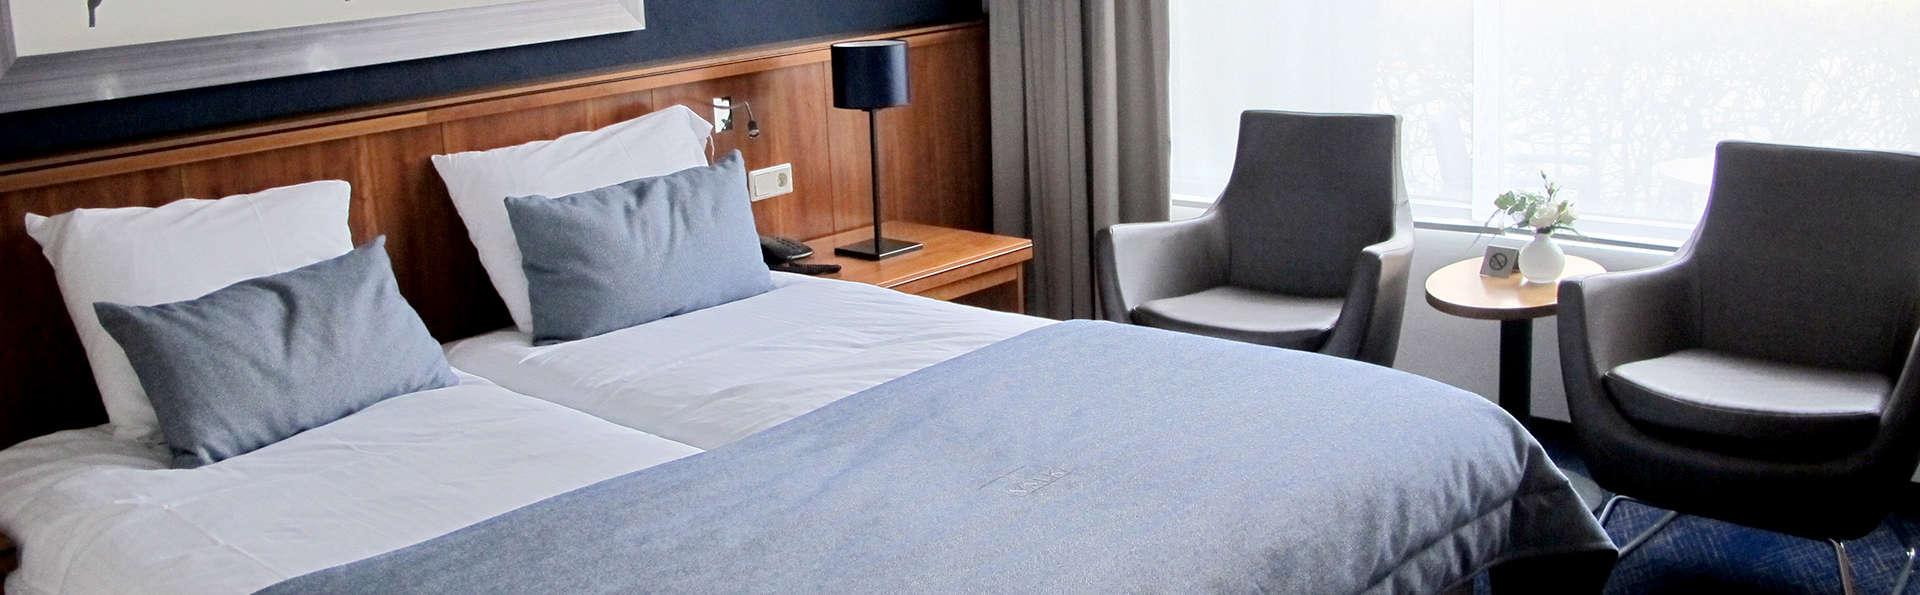 Hotel Van der Valk Den Haag Wassenaar - Edit_Room2.jpg